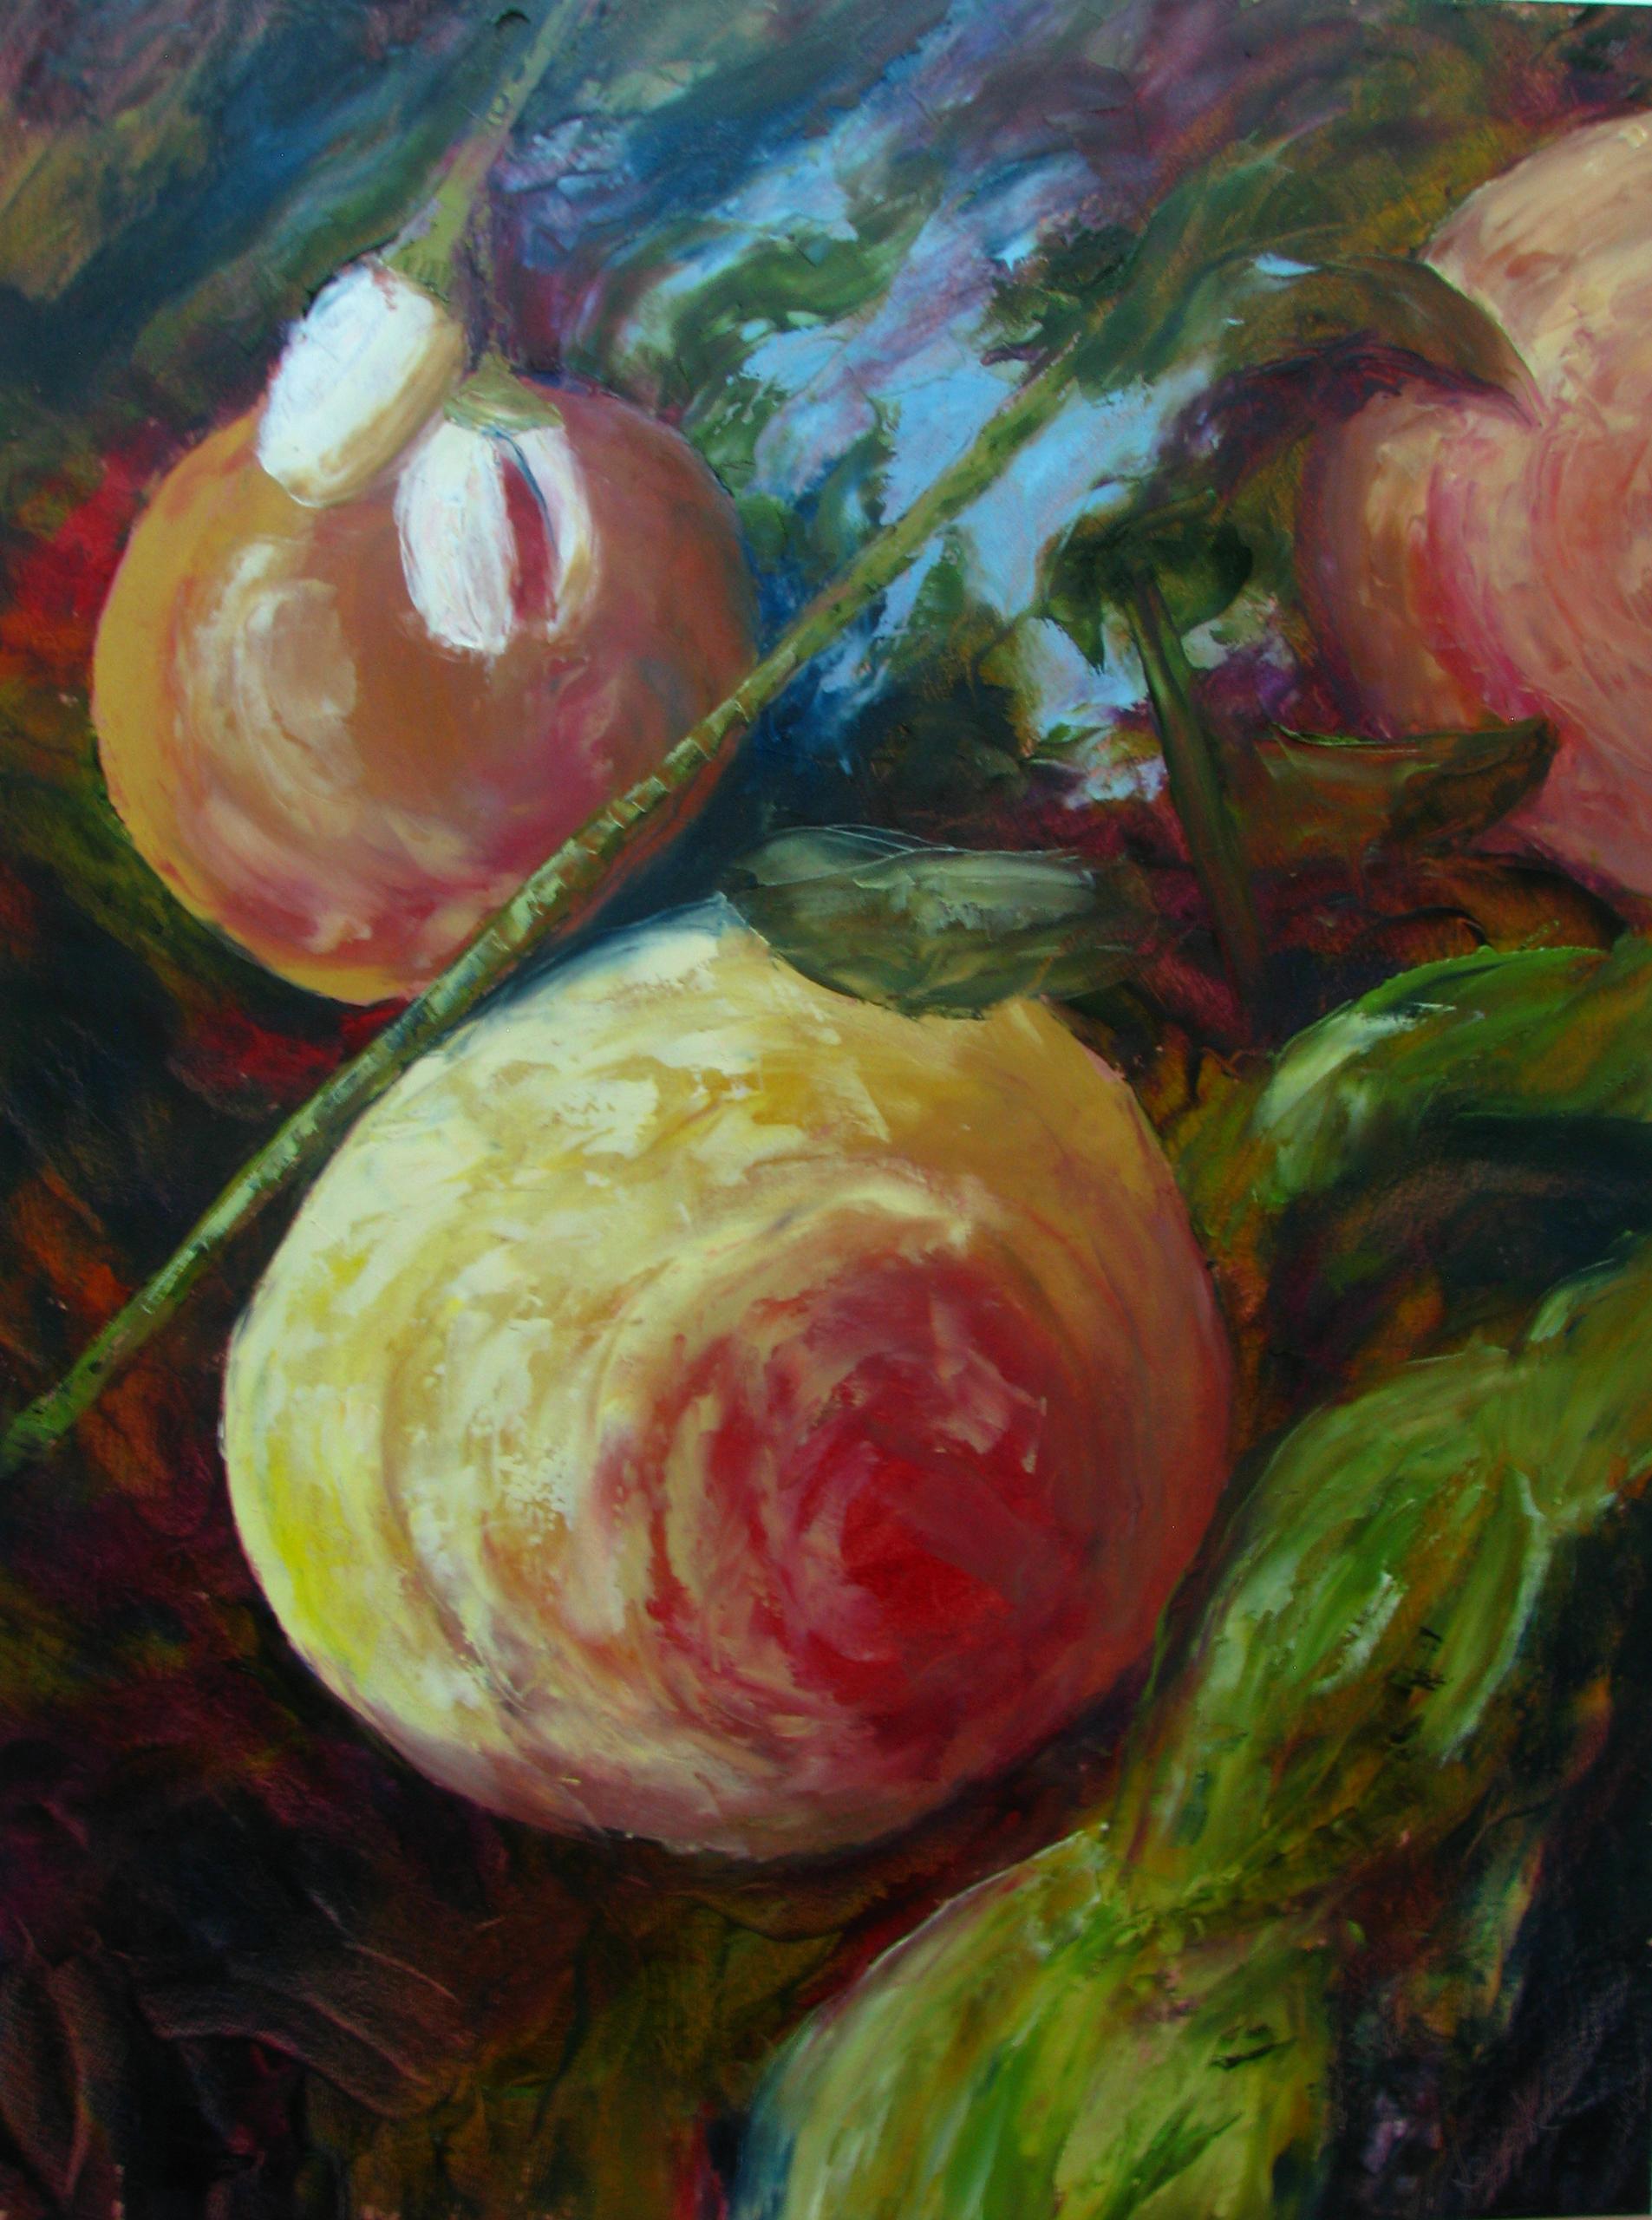 EdibleSunshine-PinkGrapefruit&Blossoms6x8.jpg